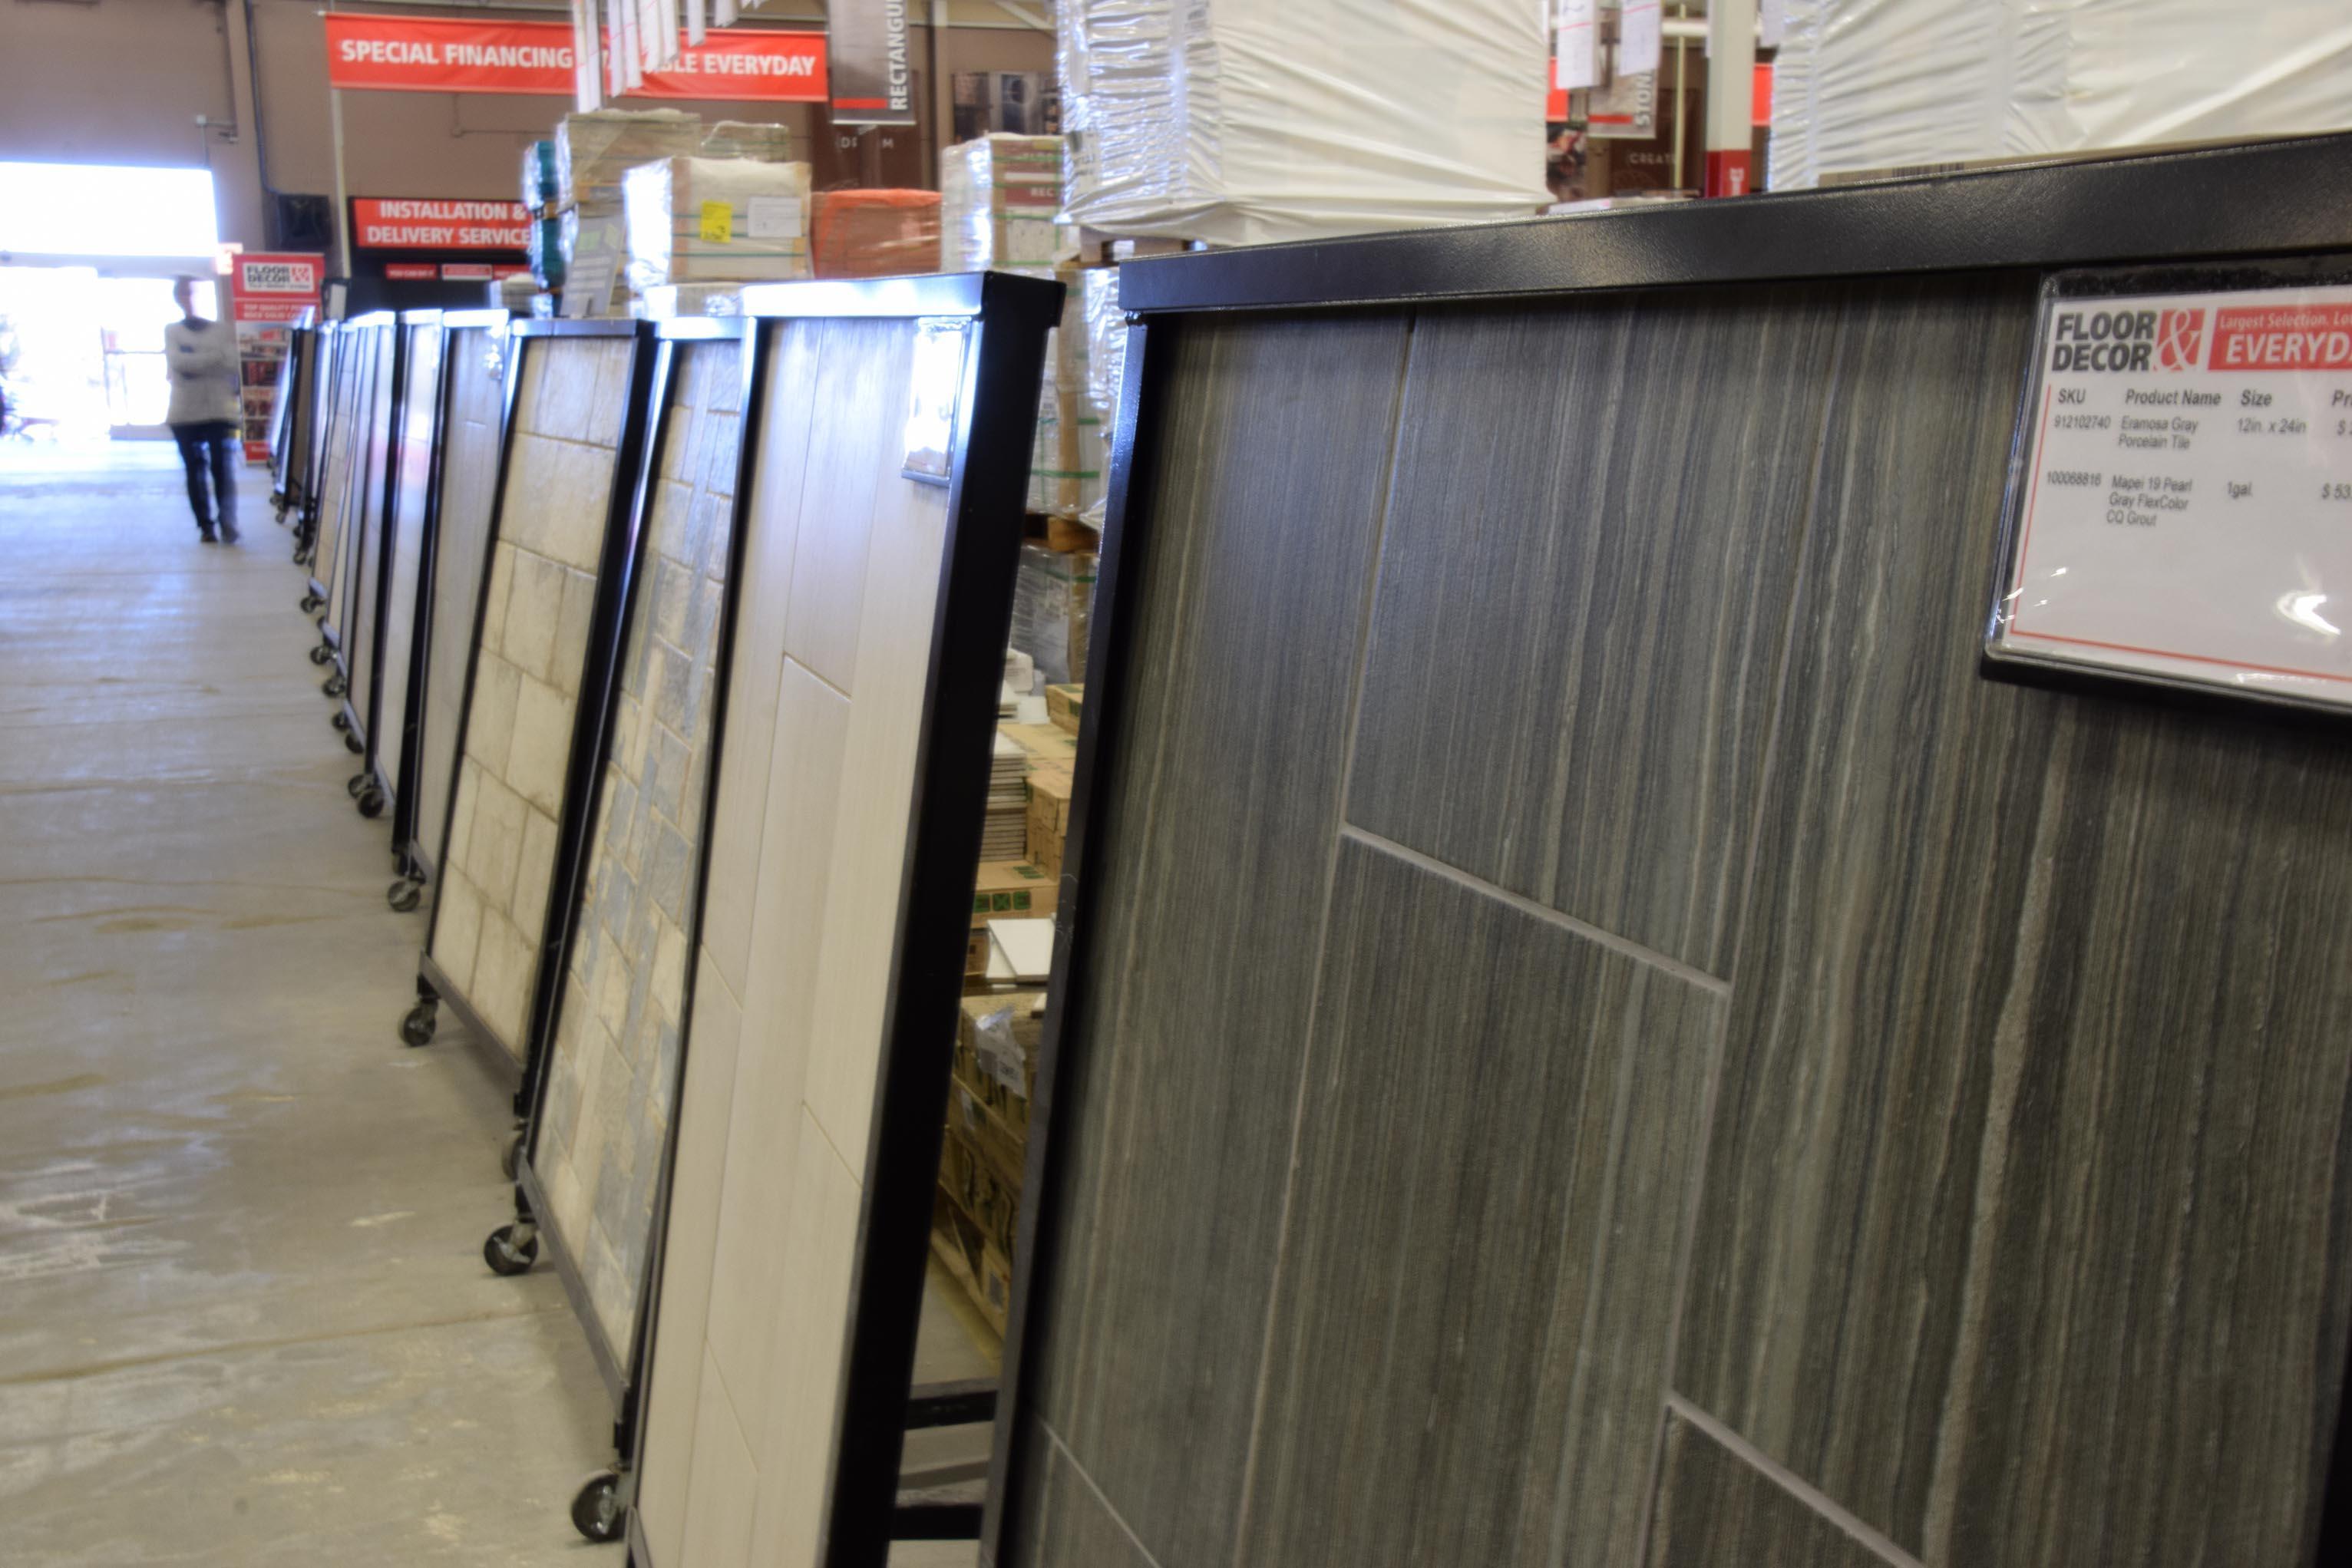 Floor Decor 1980 E County Line Rd Highlands Ranch Co Tile Ceramic Contractors Dealers Mapquest